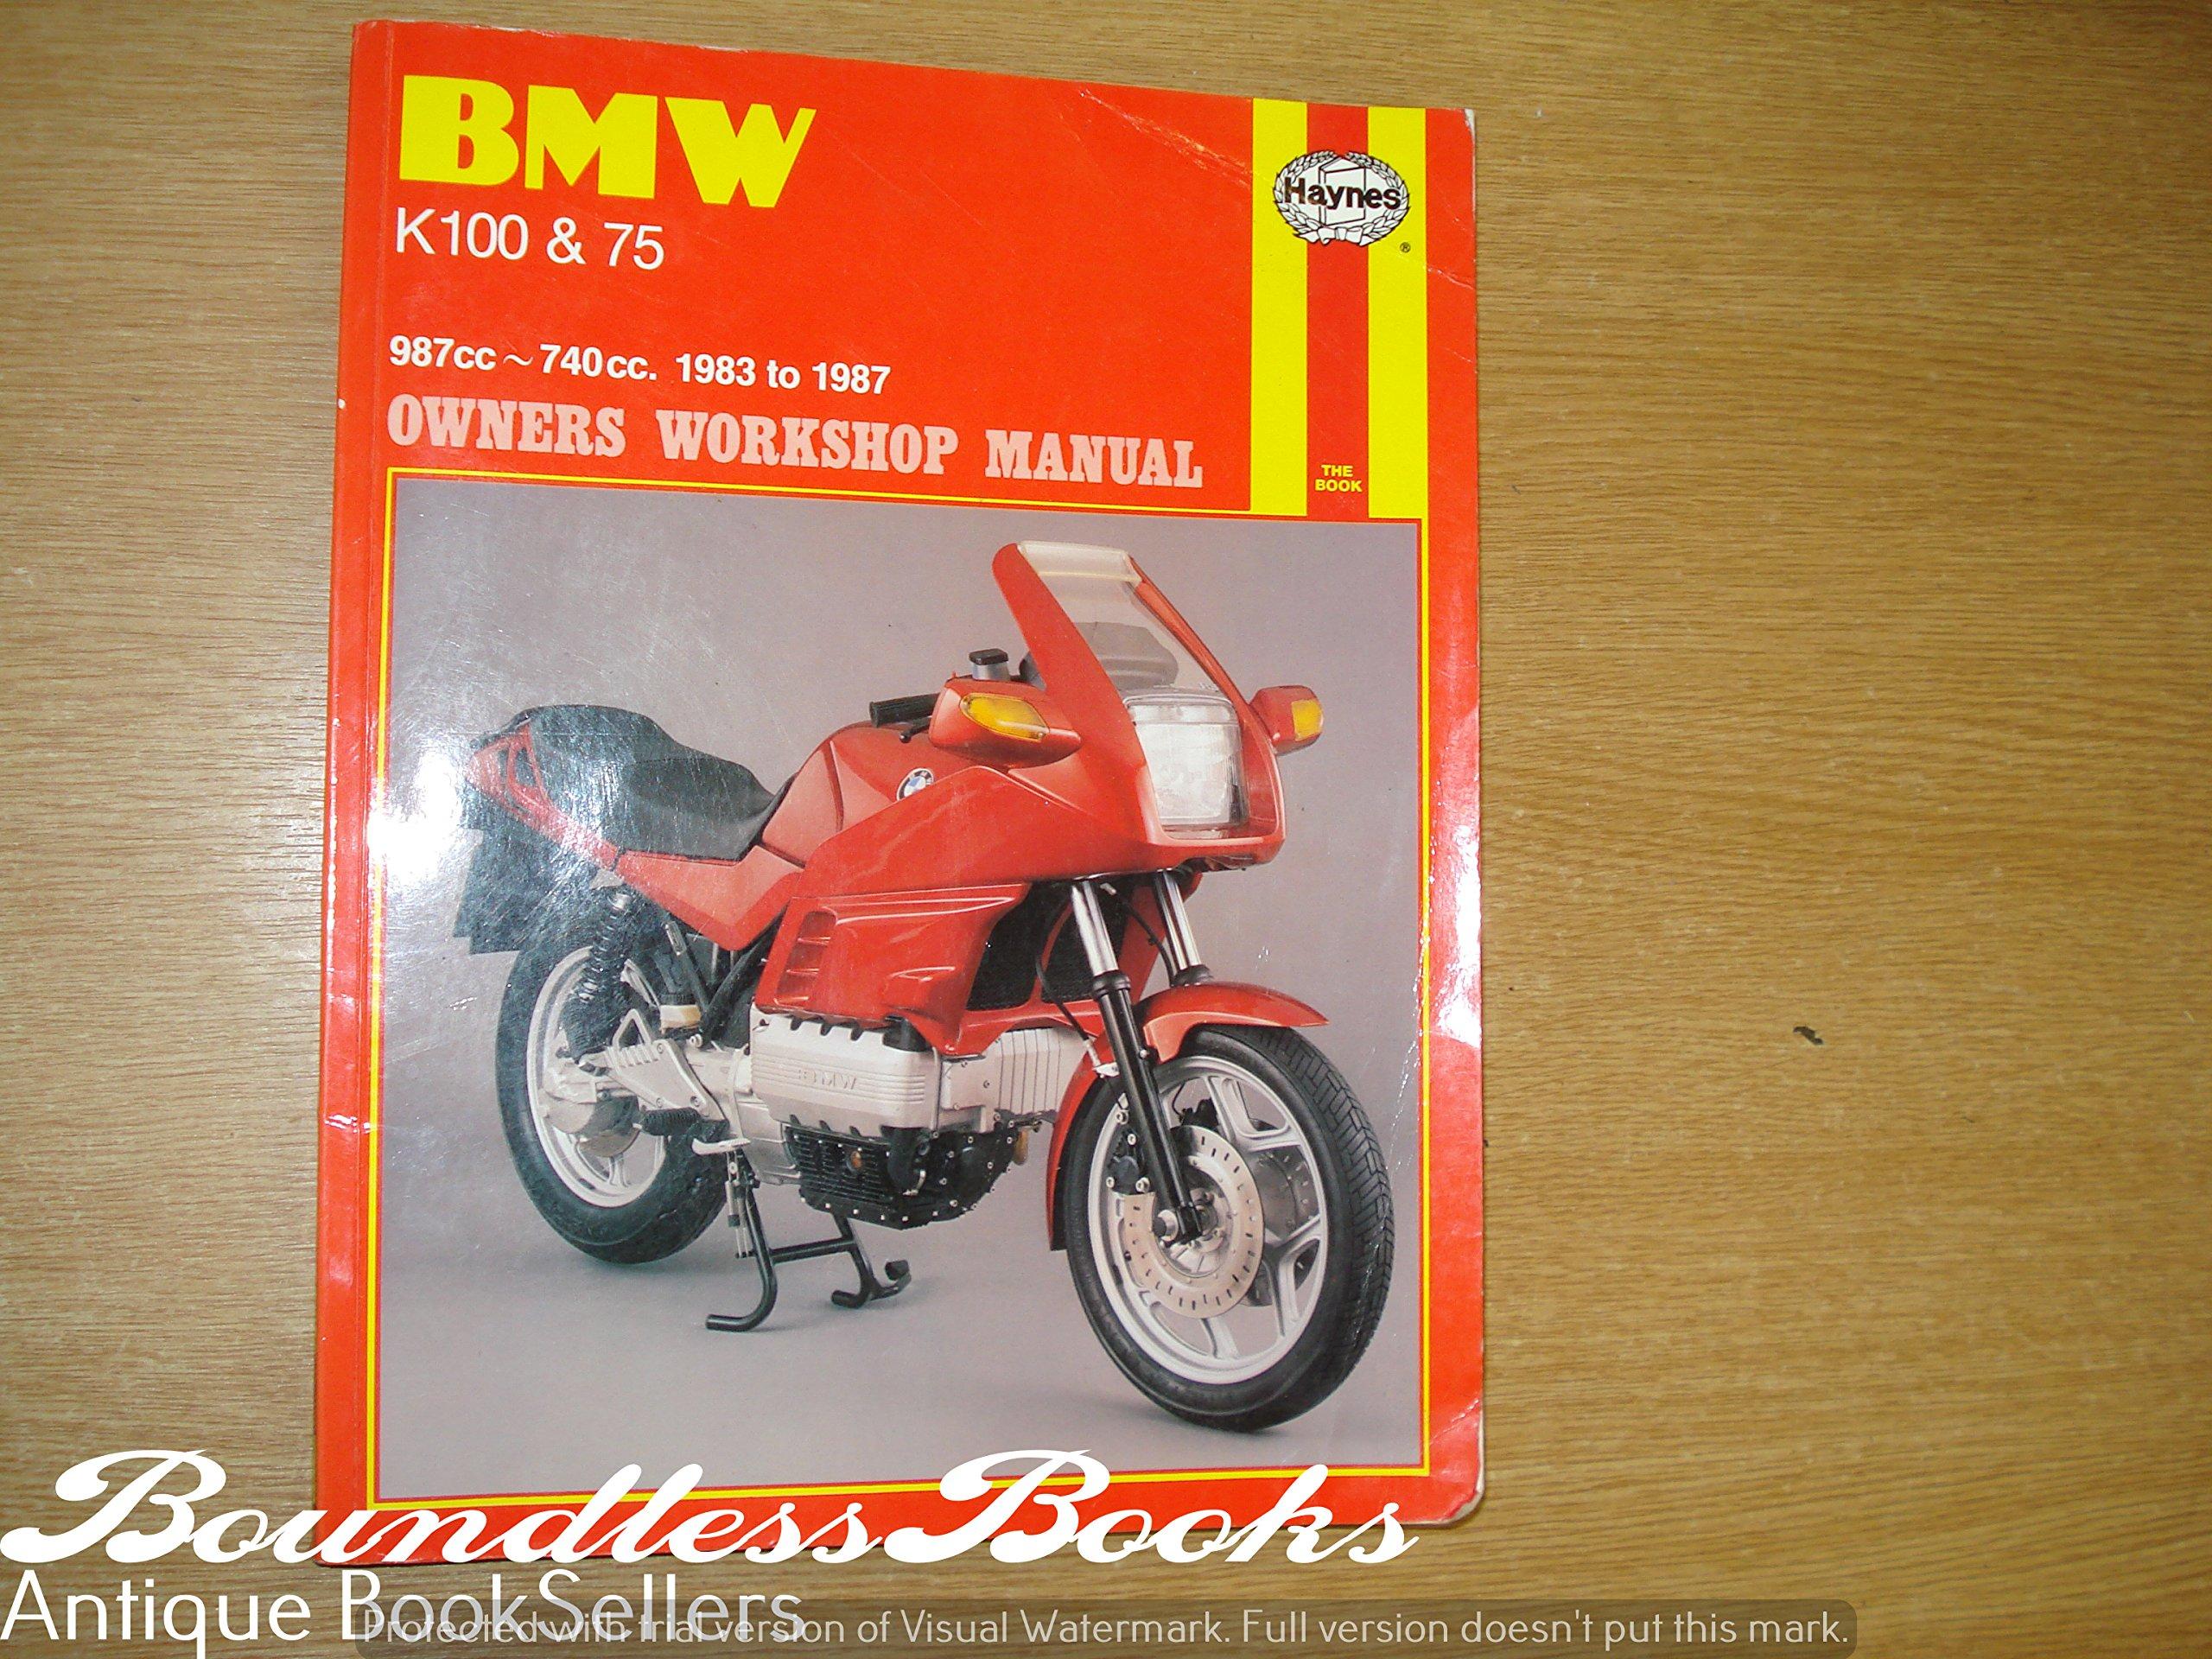 BMW K100 & 75 Owners Workshop Manual, 1983 to 1987 (987cc; 740 cc): Jeremy  Churchill: 9781850103738: Amazon.com: Books